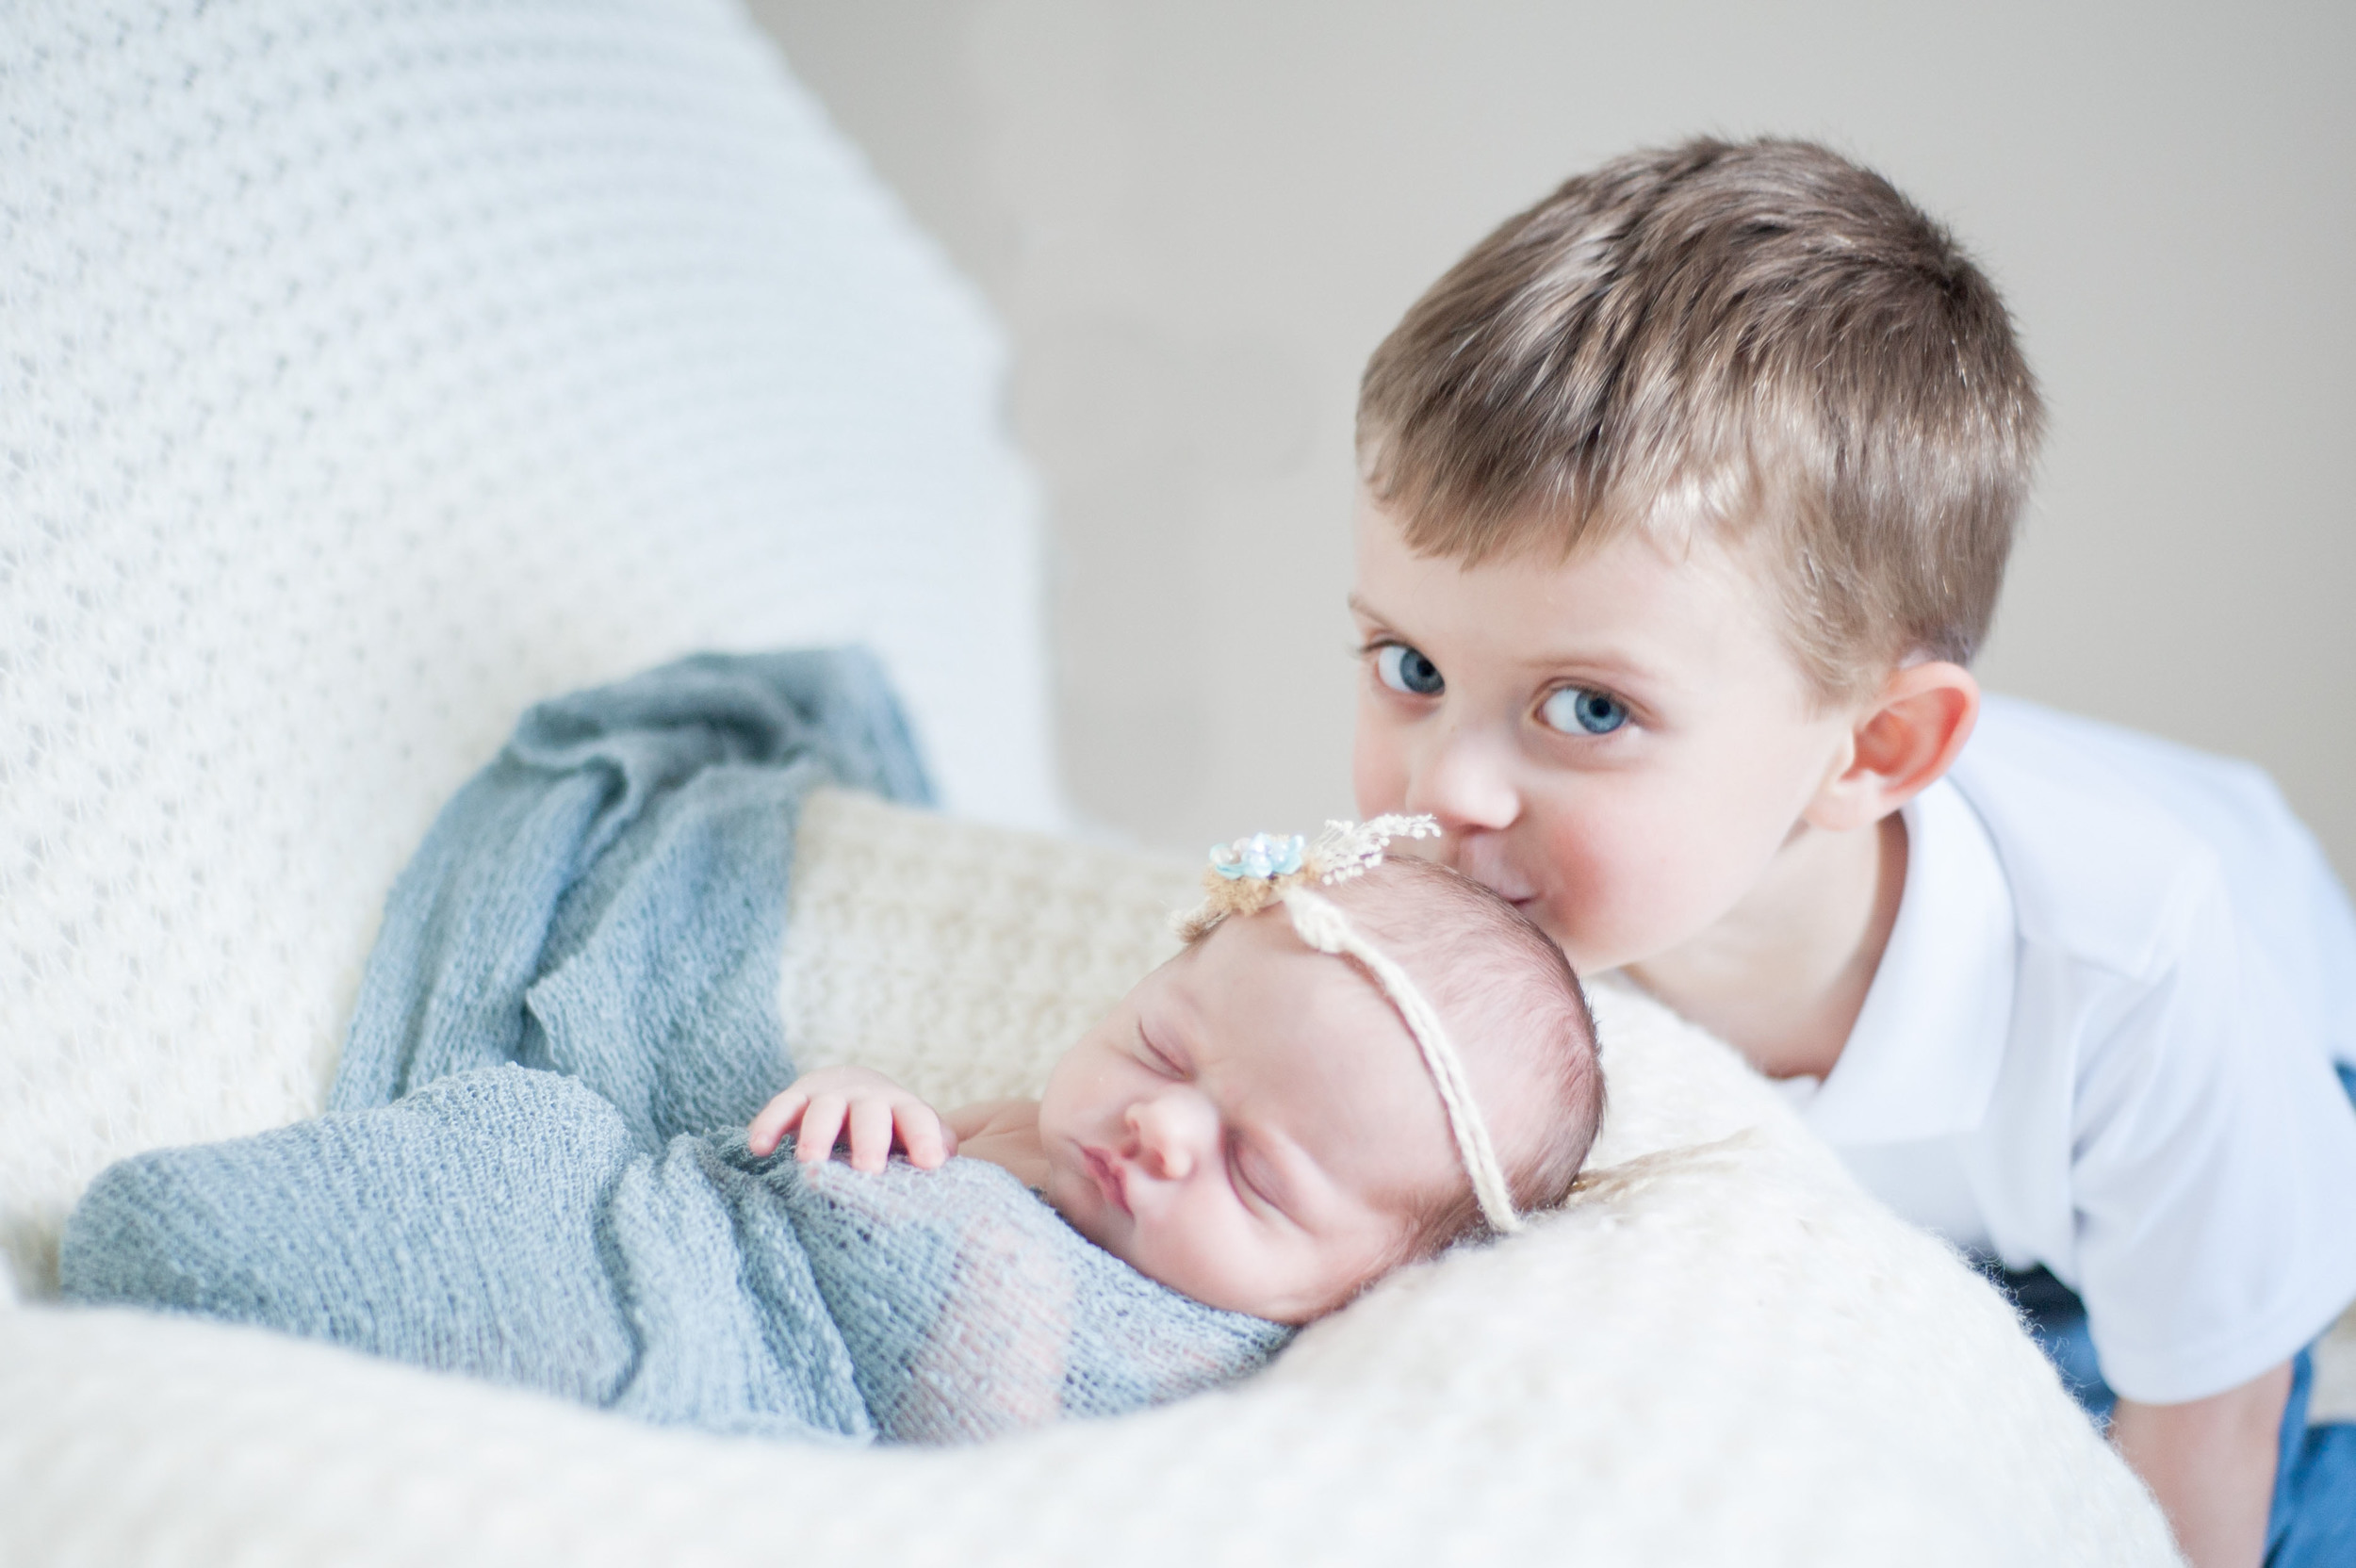 Northshore ma newborn sibling photographer lucia-15.jpg